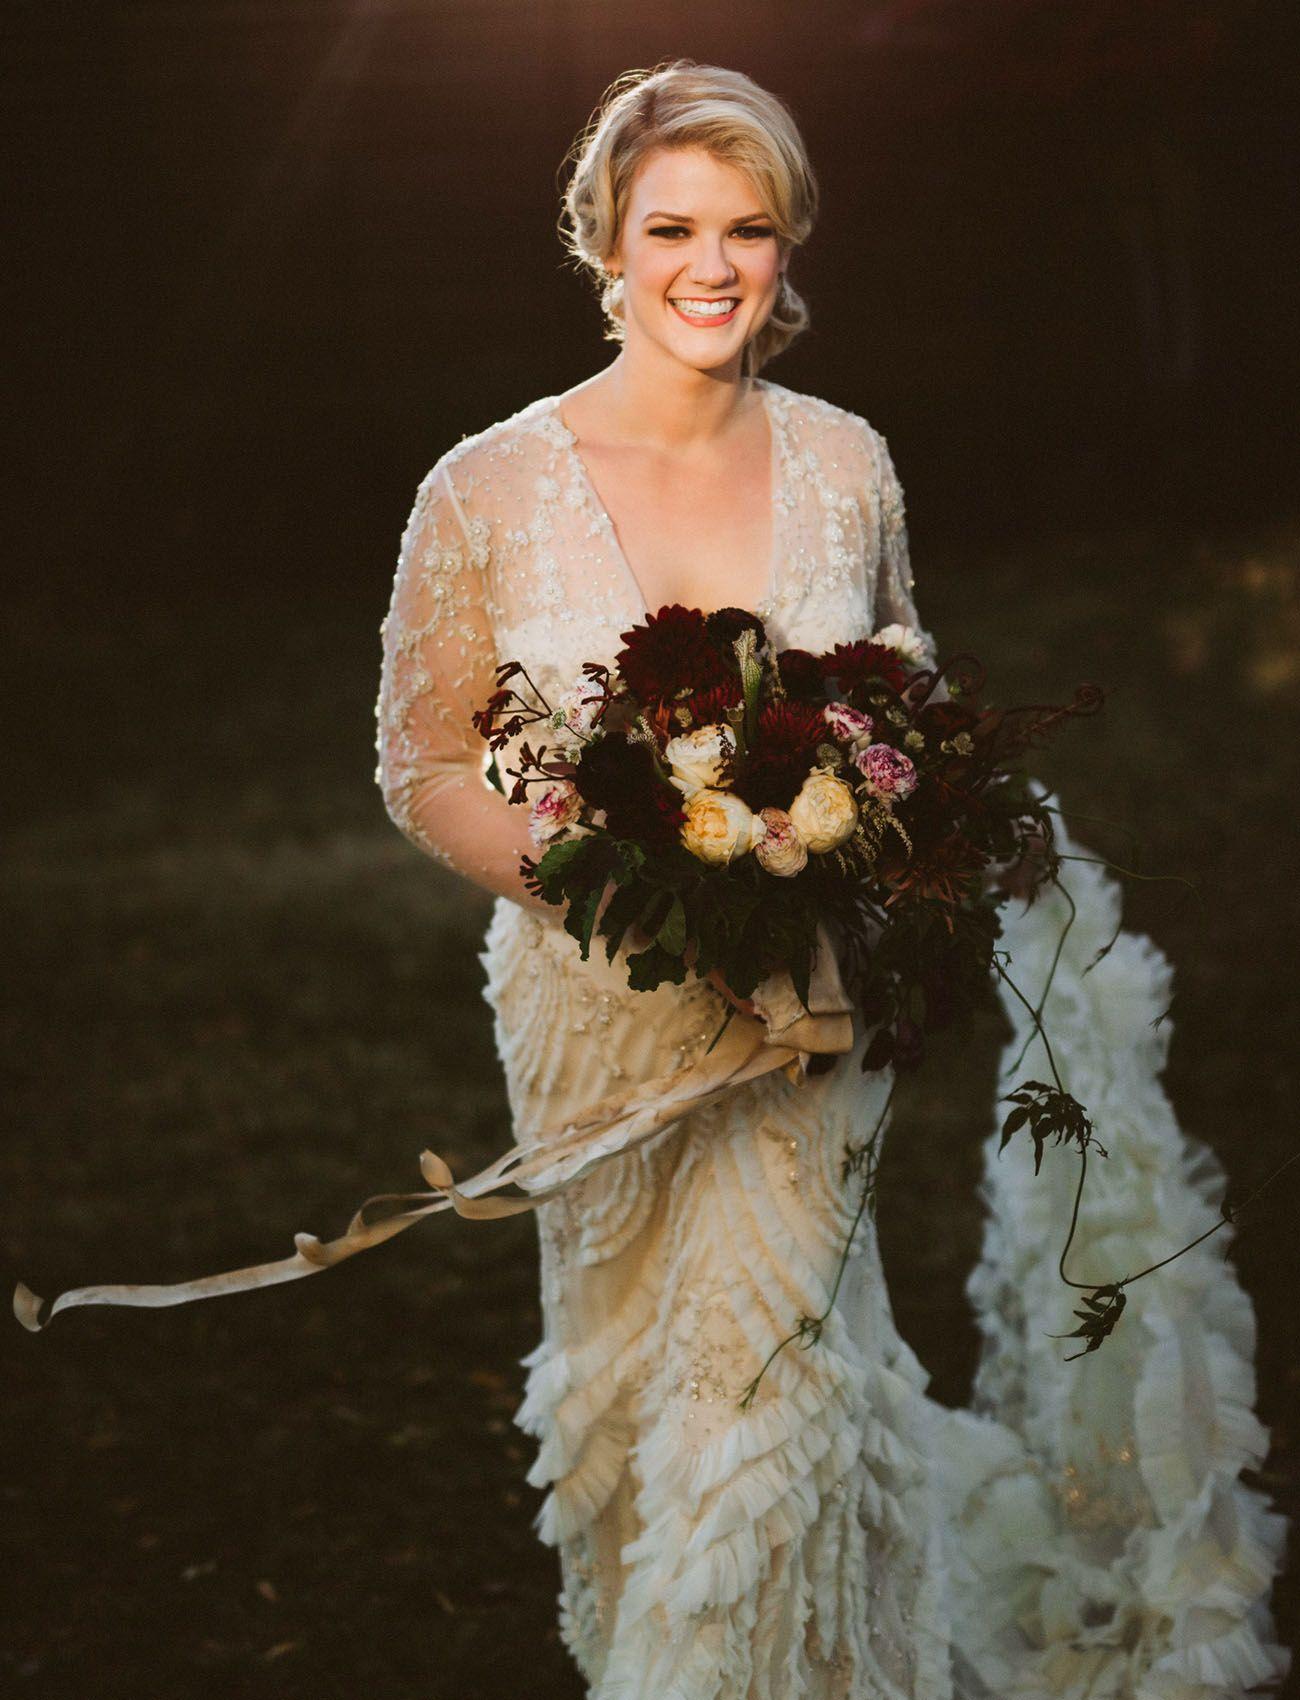 Brown wedding dresses  Modern Meets Old Hollywood A Glamorous VintageInspired Wedding in